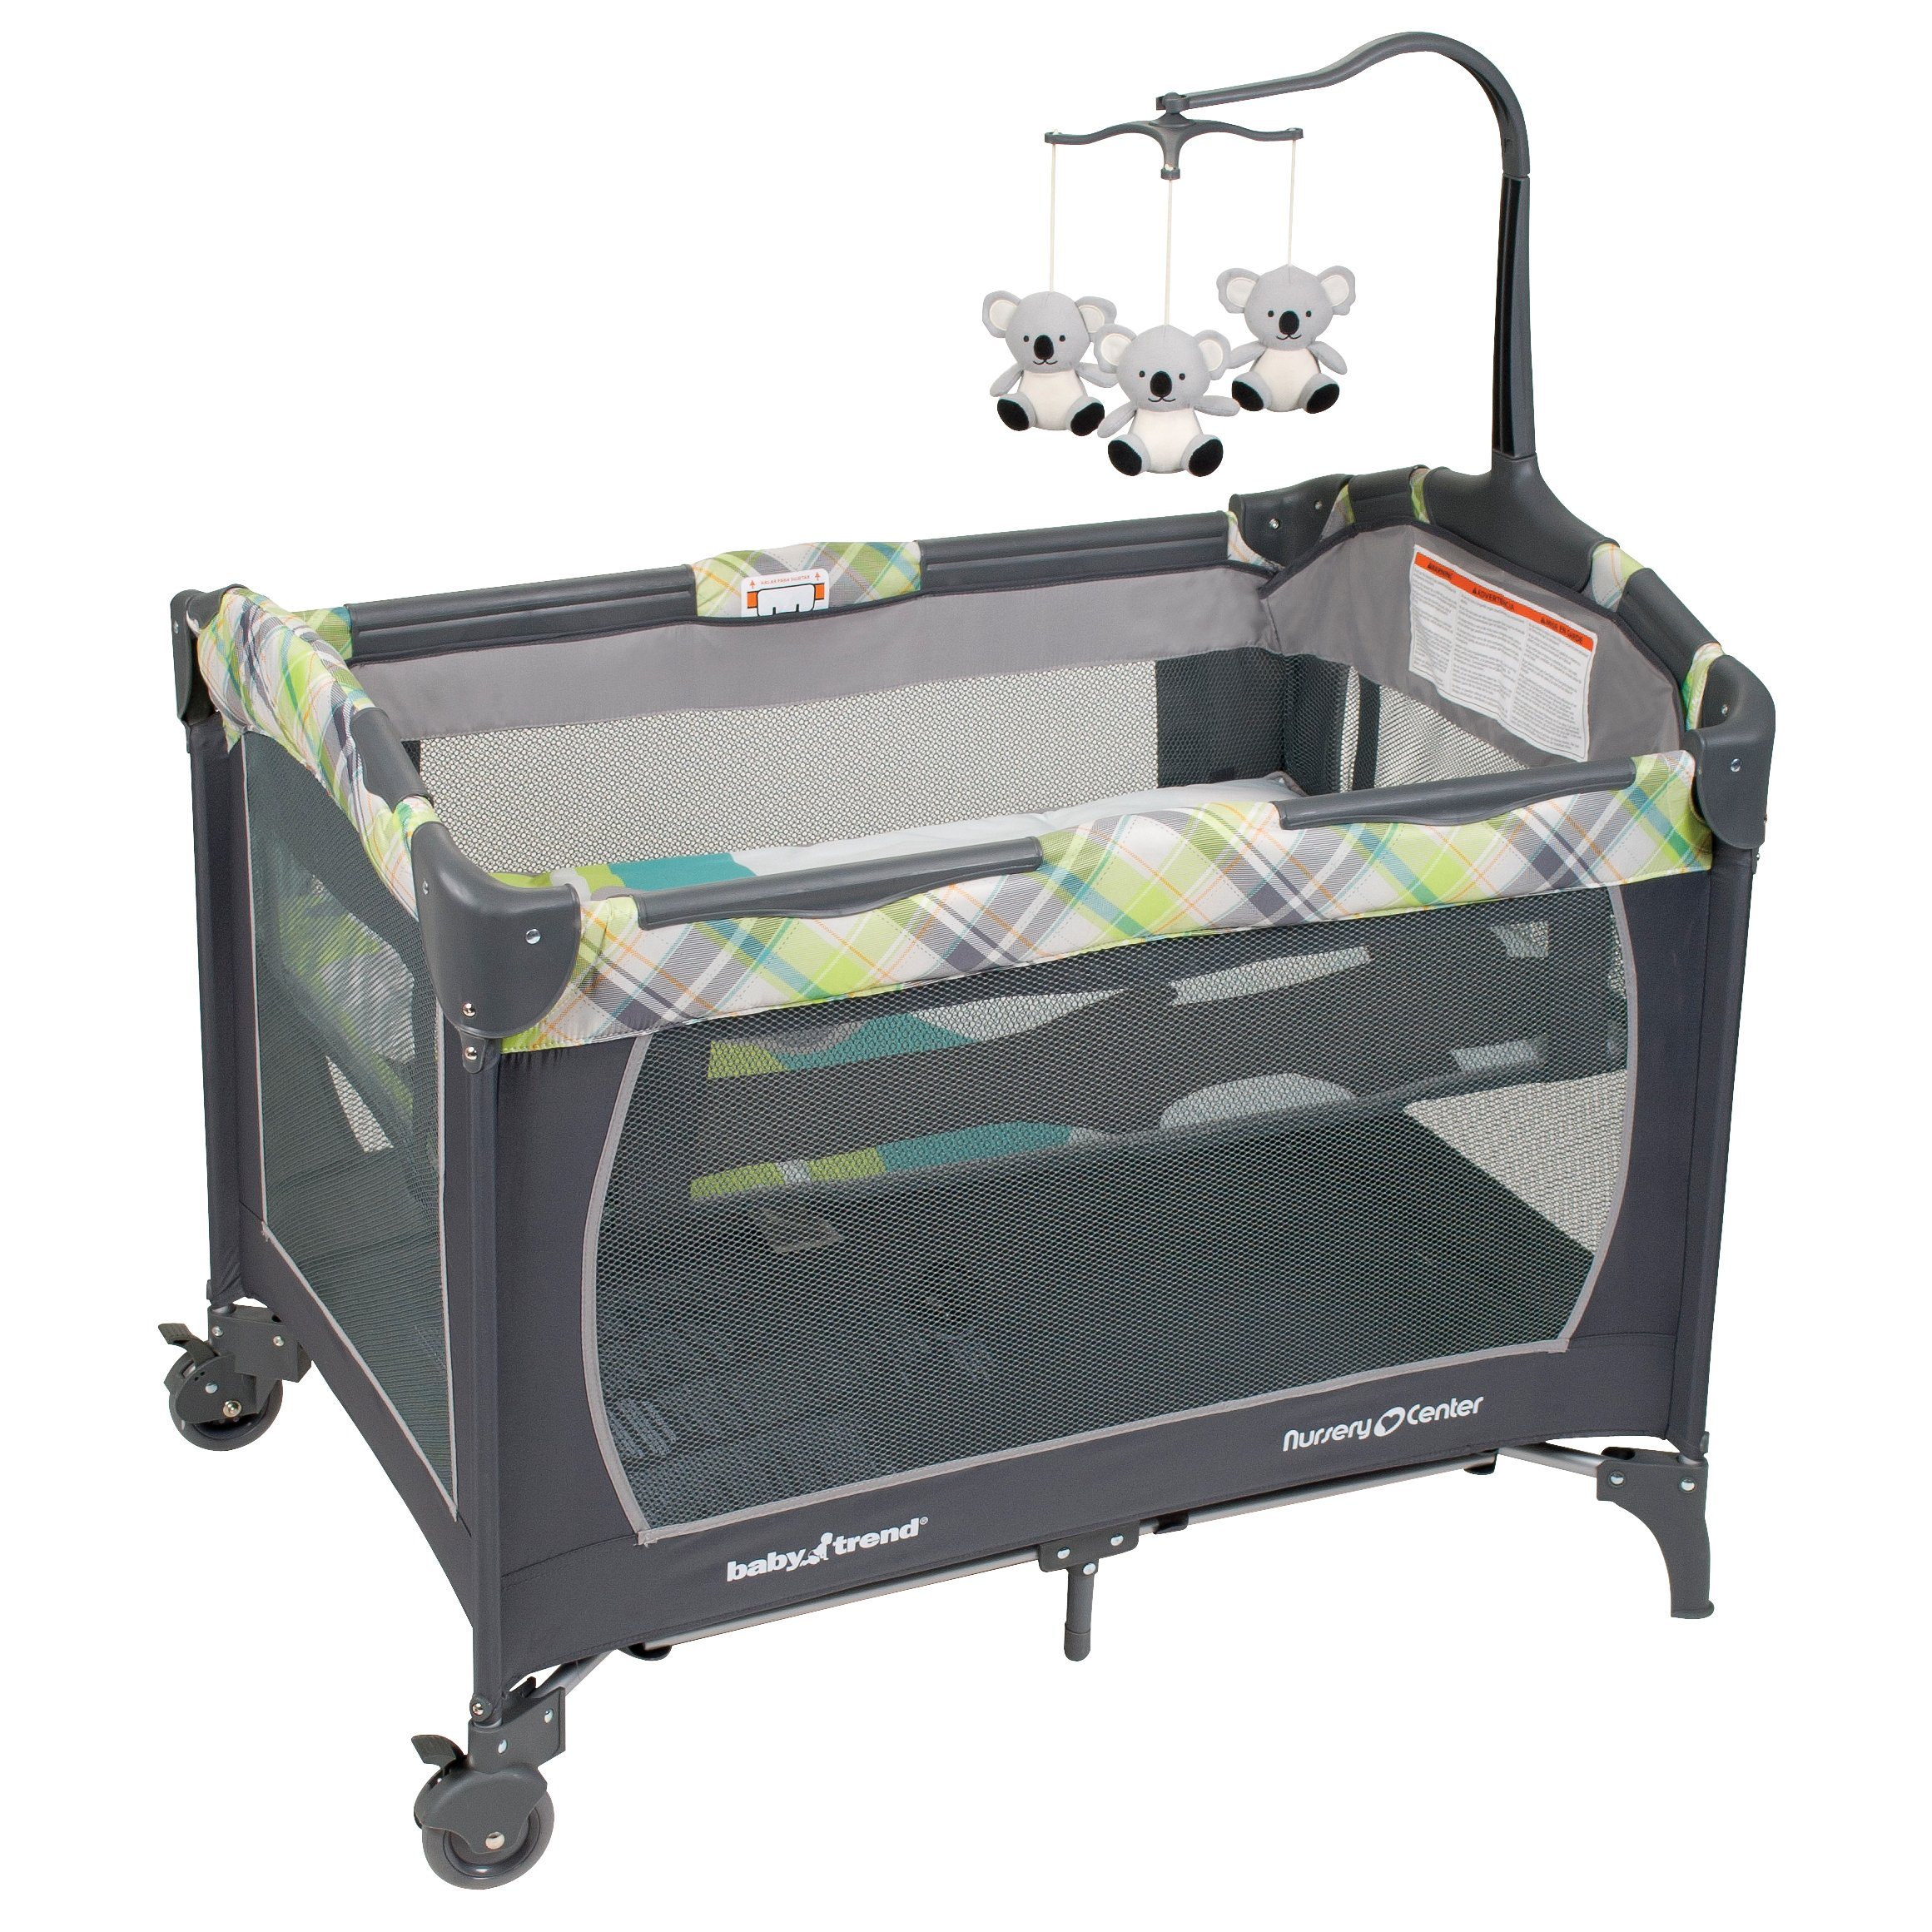 Amazon Baby Trend Nursery Center Playard Outback Baby